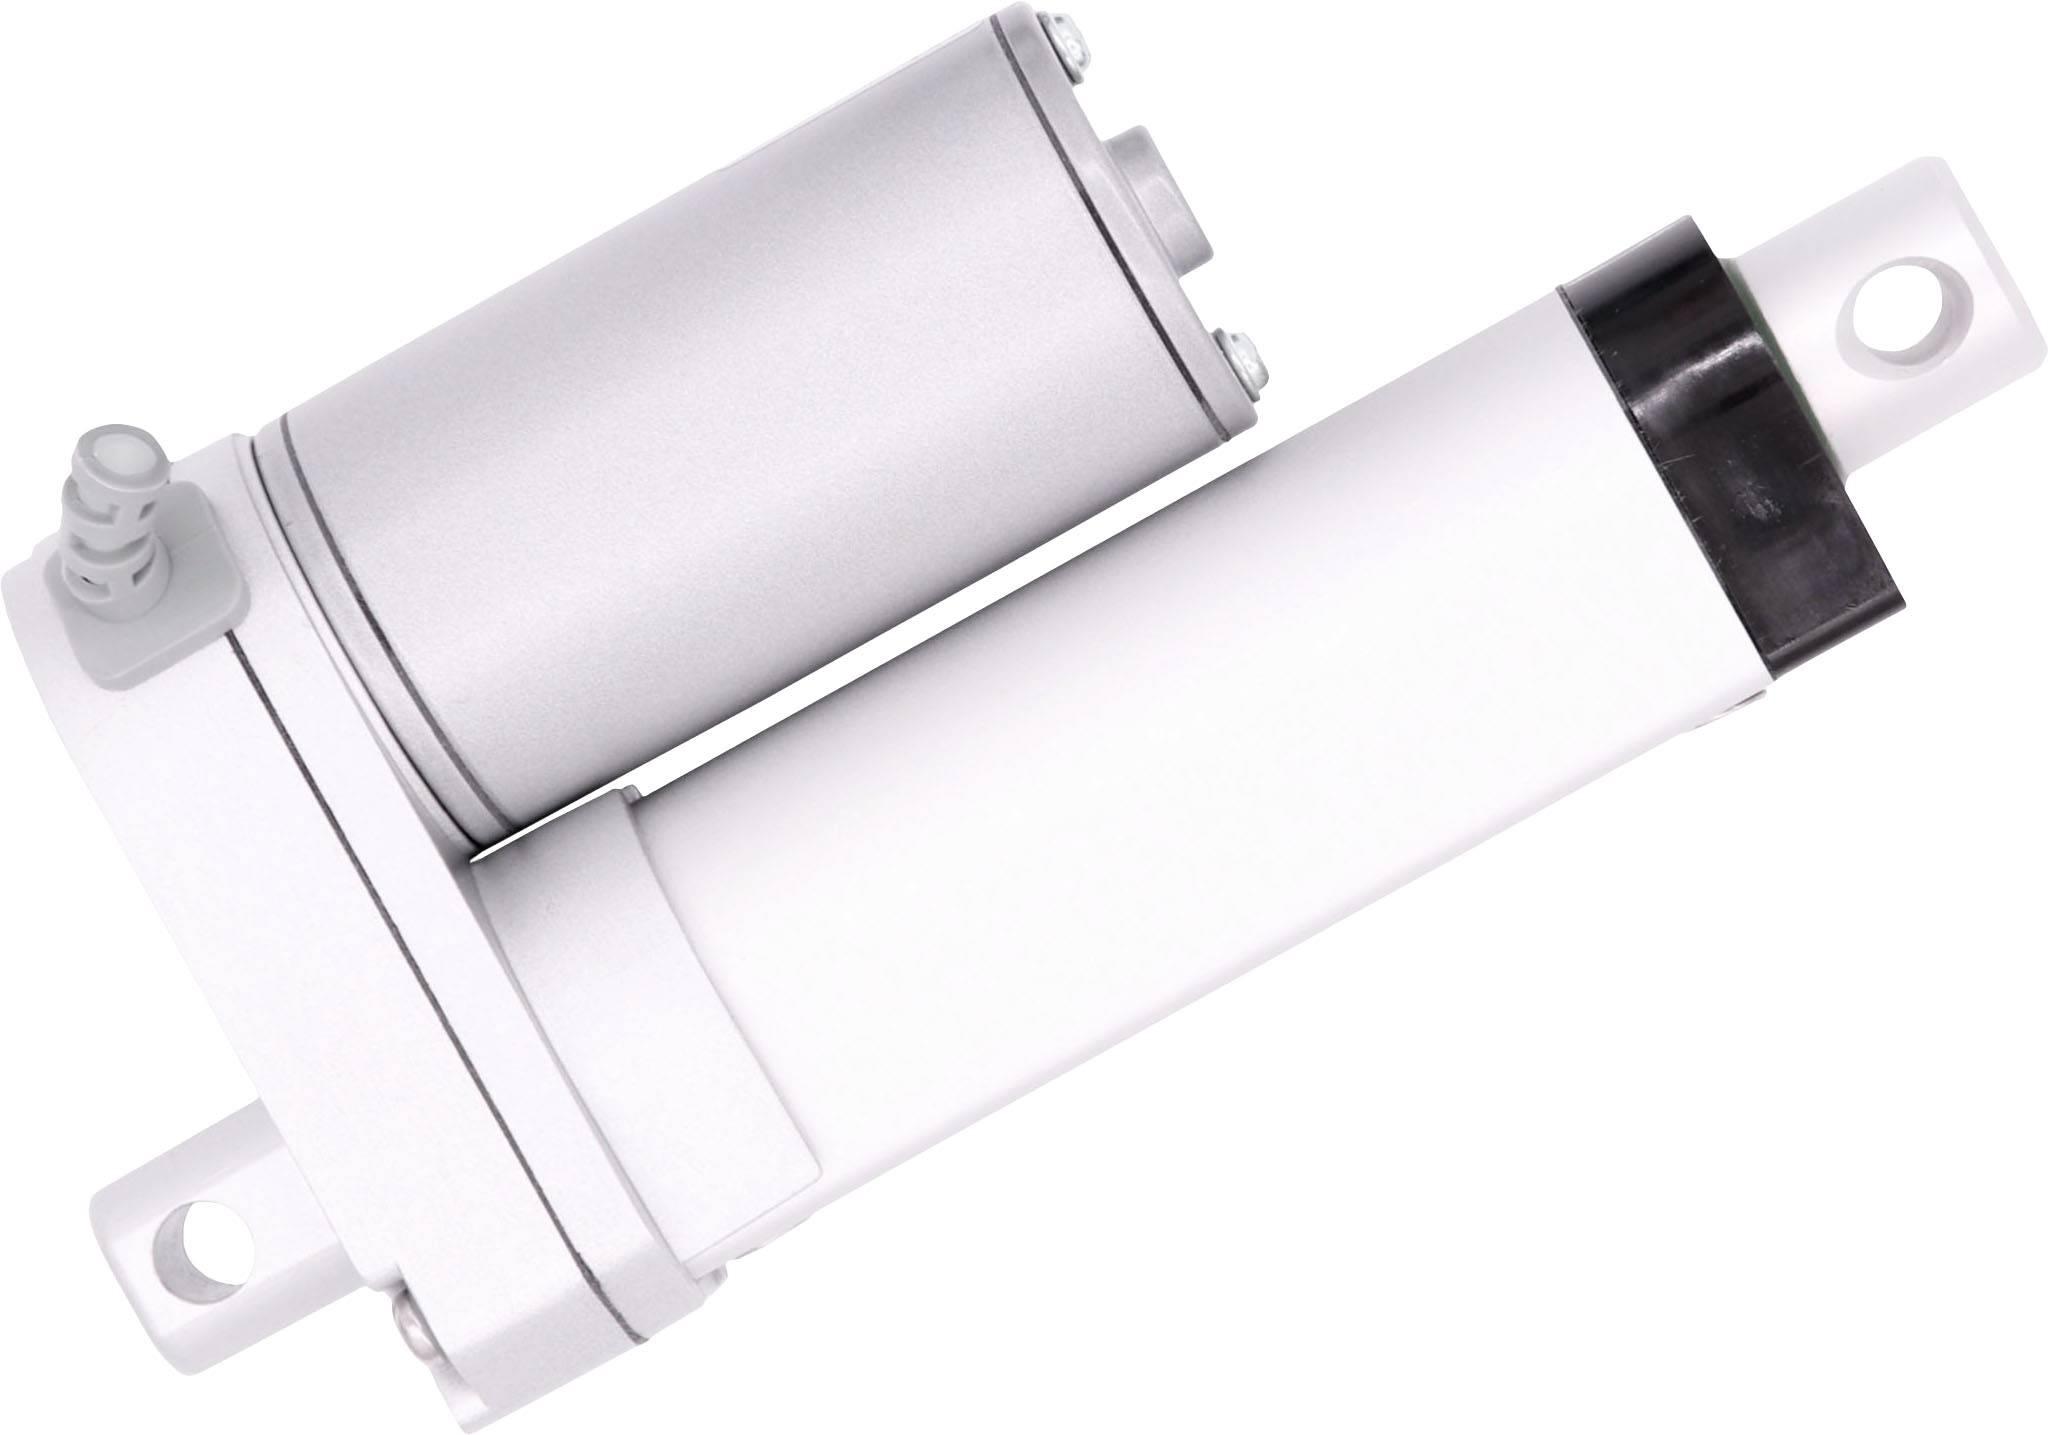 Lineární servomotor Drive-System Europe DSZY1-12-40-A-050-IP65, 1000 N, 12 V/DC, délka 50 mm